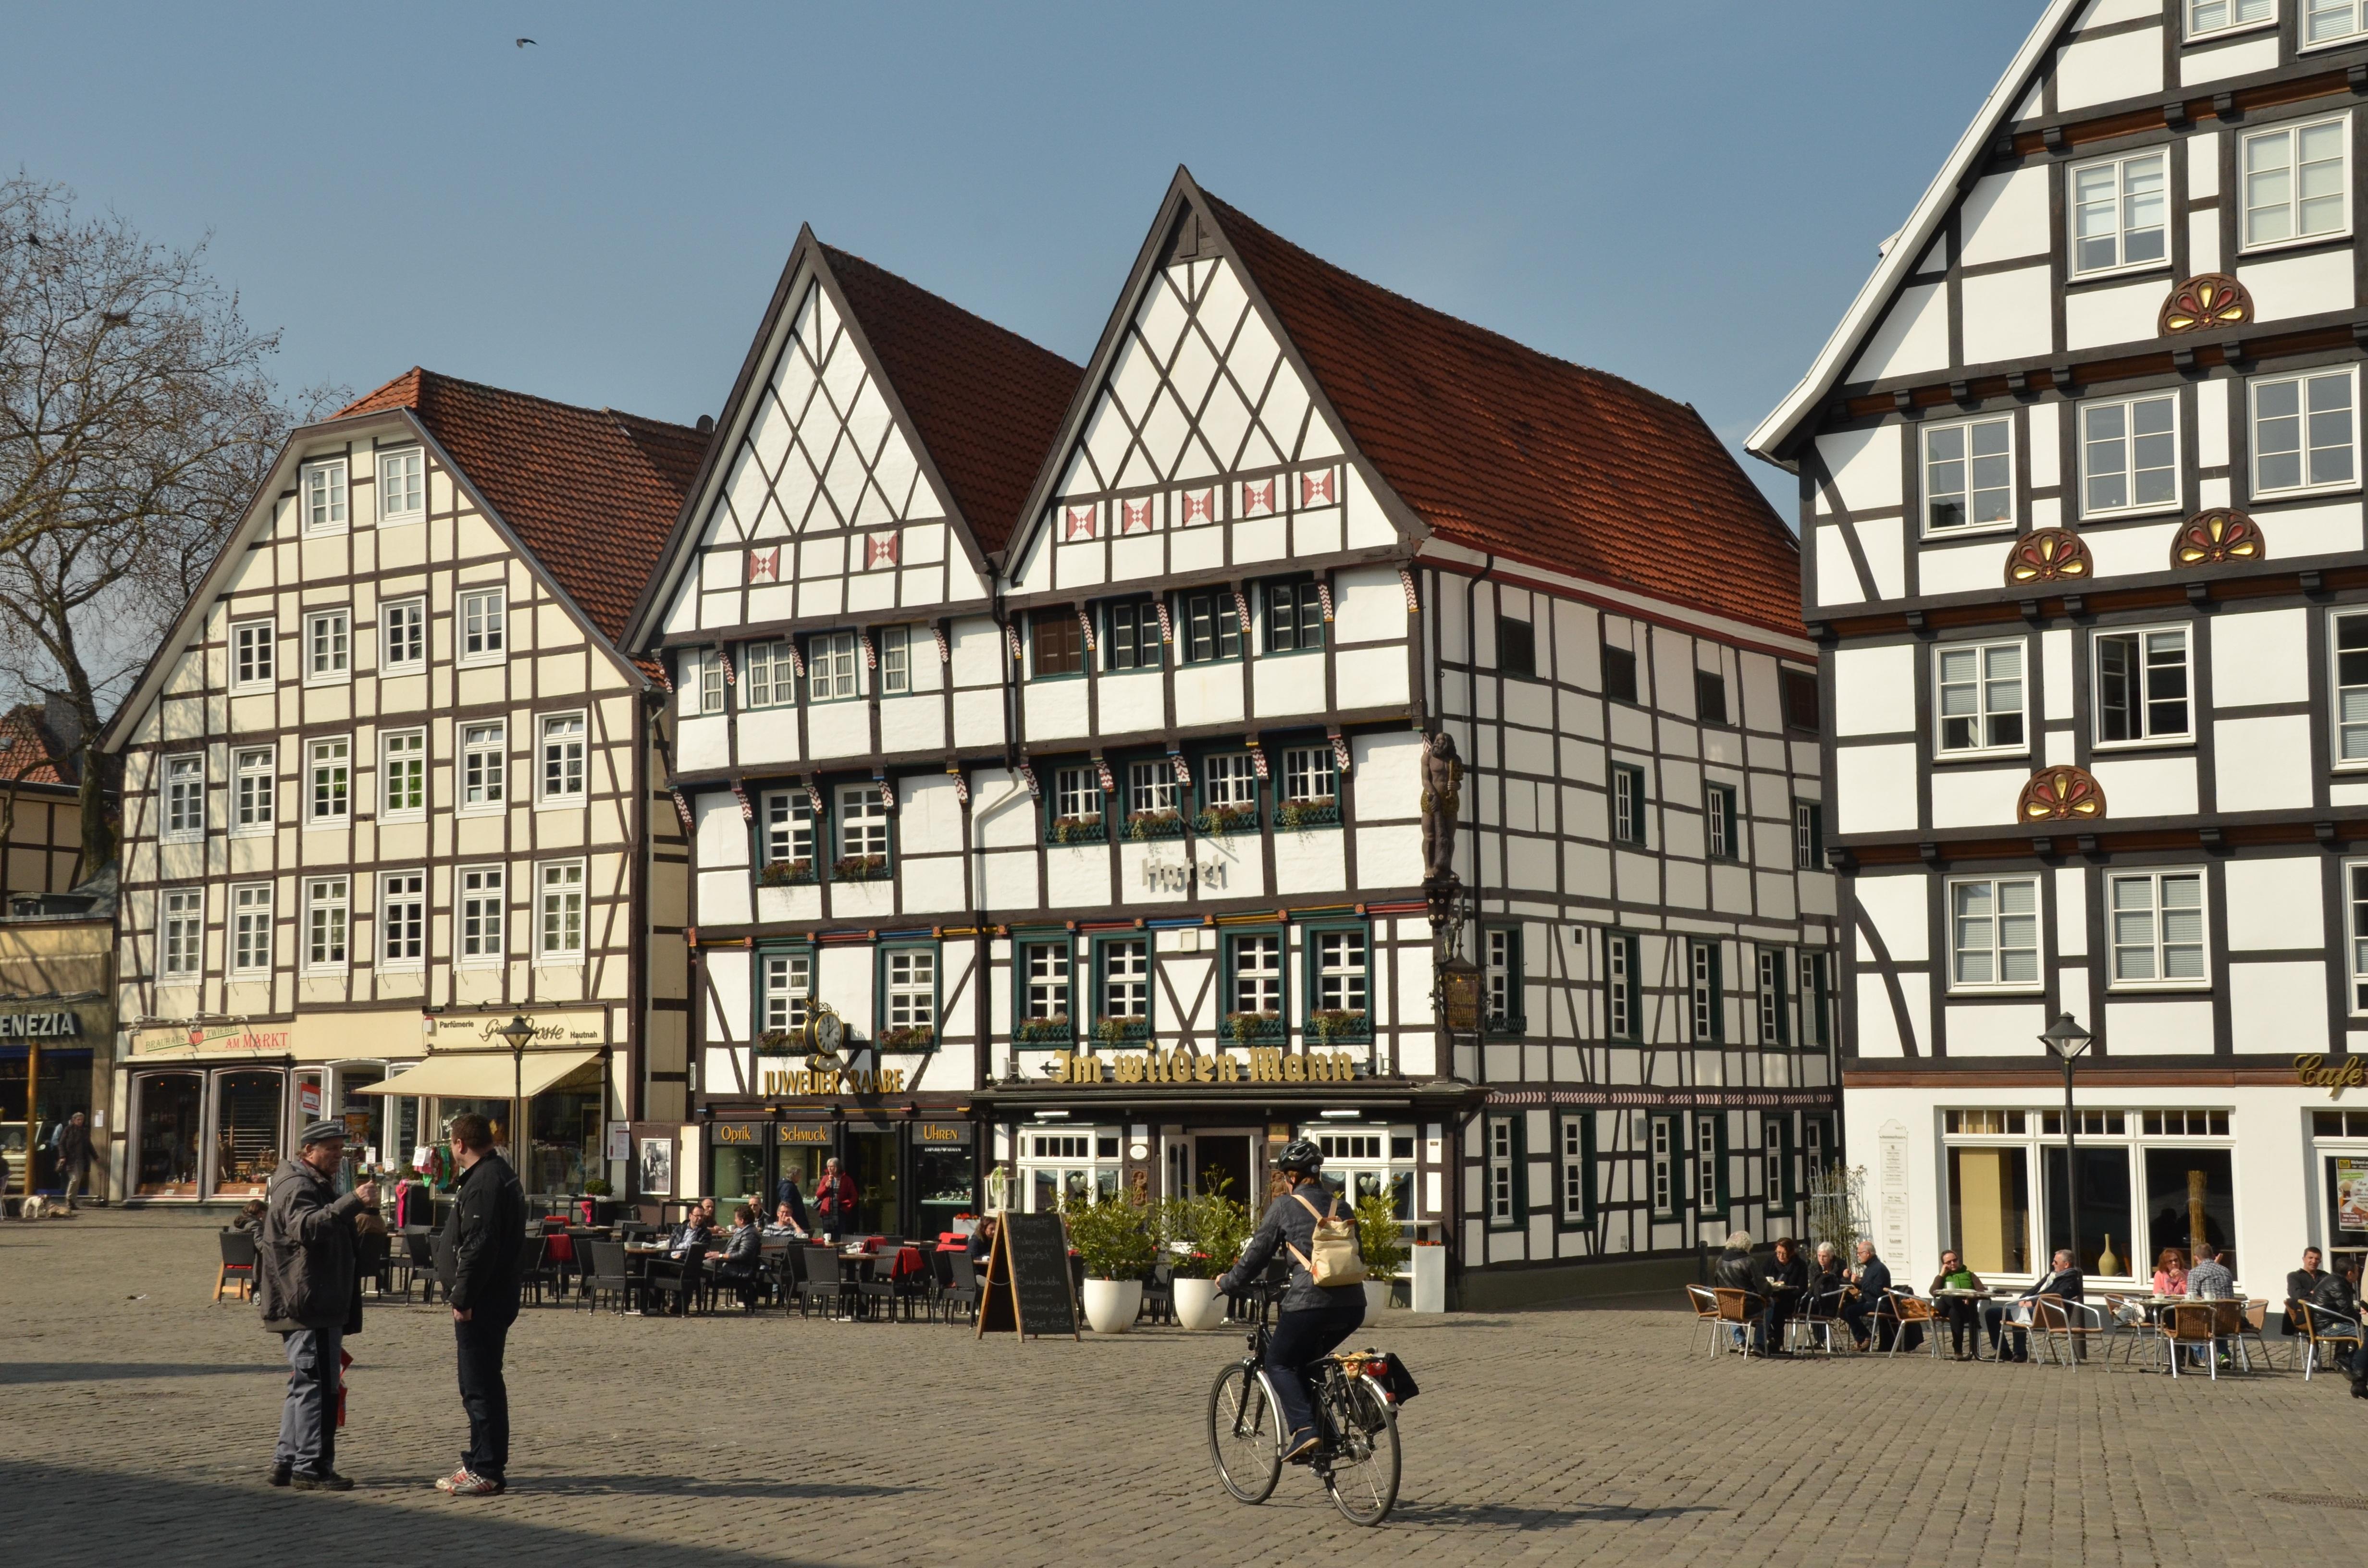 Fotos gratis : arquitectura, sol, pueblo, edificio, bicicleta ...